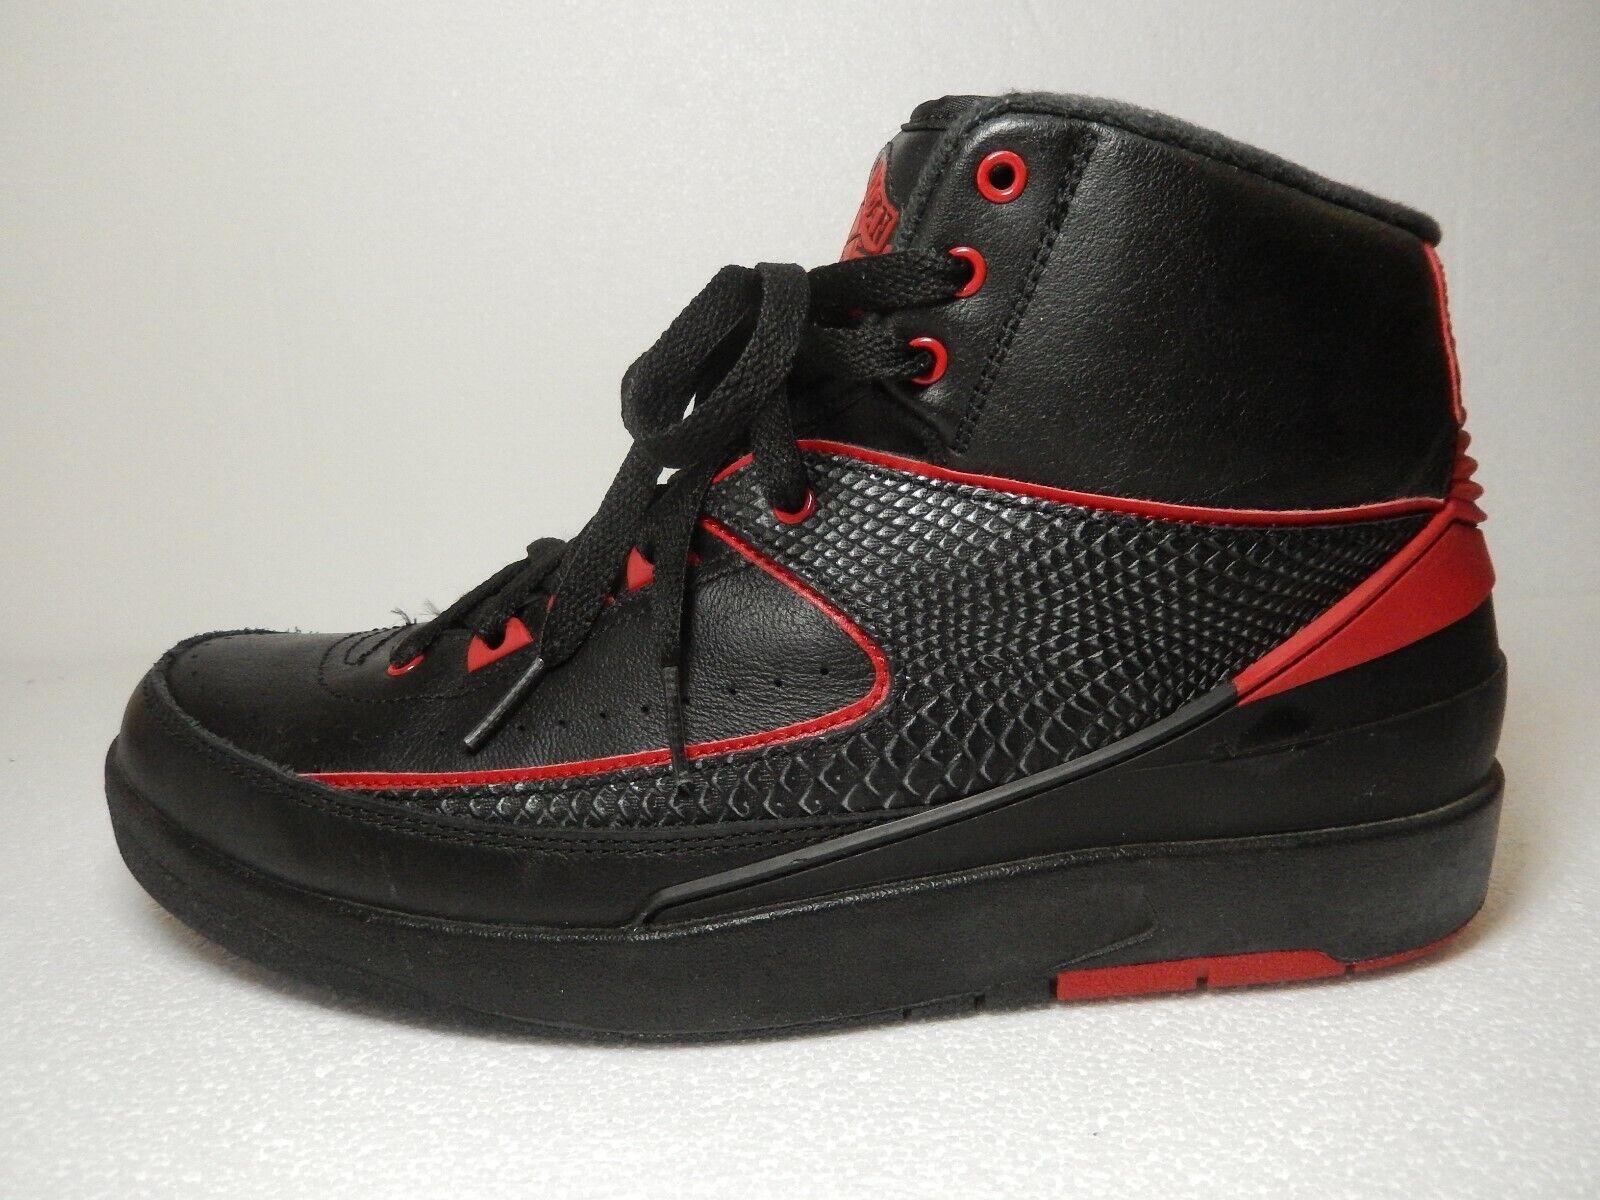 NICE-Air Jordan 2 II Retro Alternate 87 Black Varsity Red 834274-001 Mens Size 9